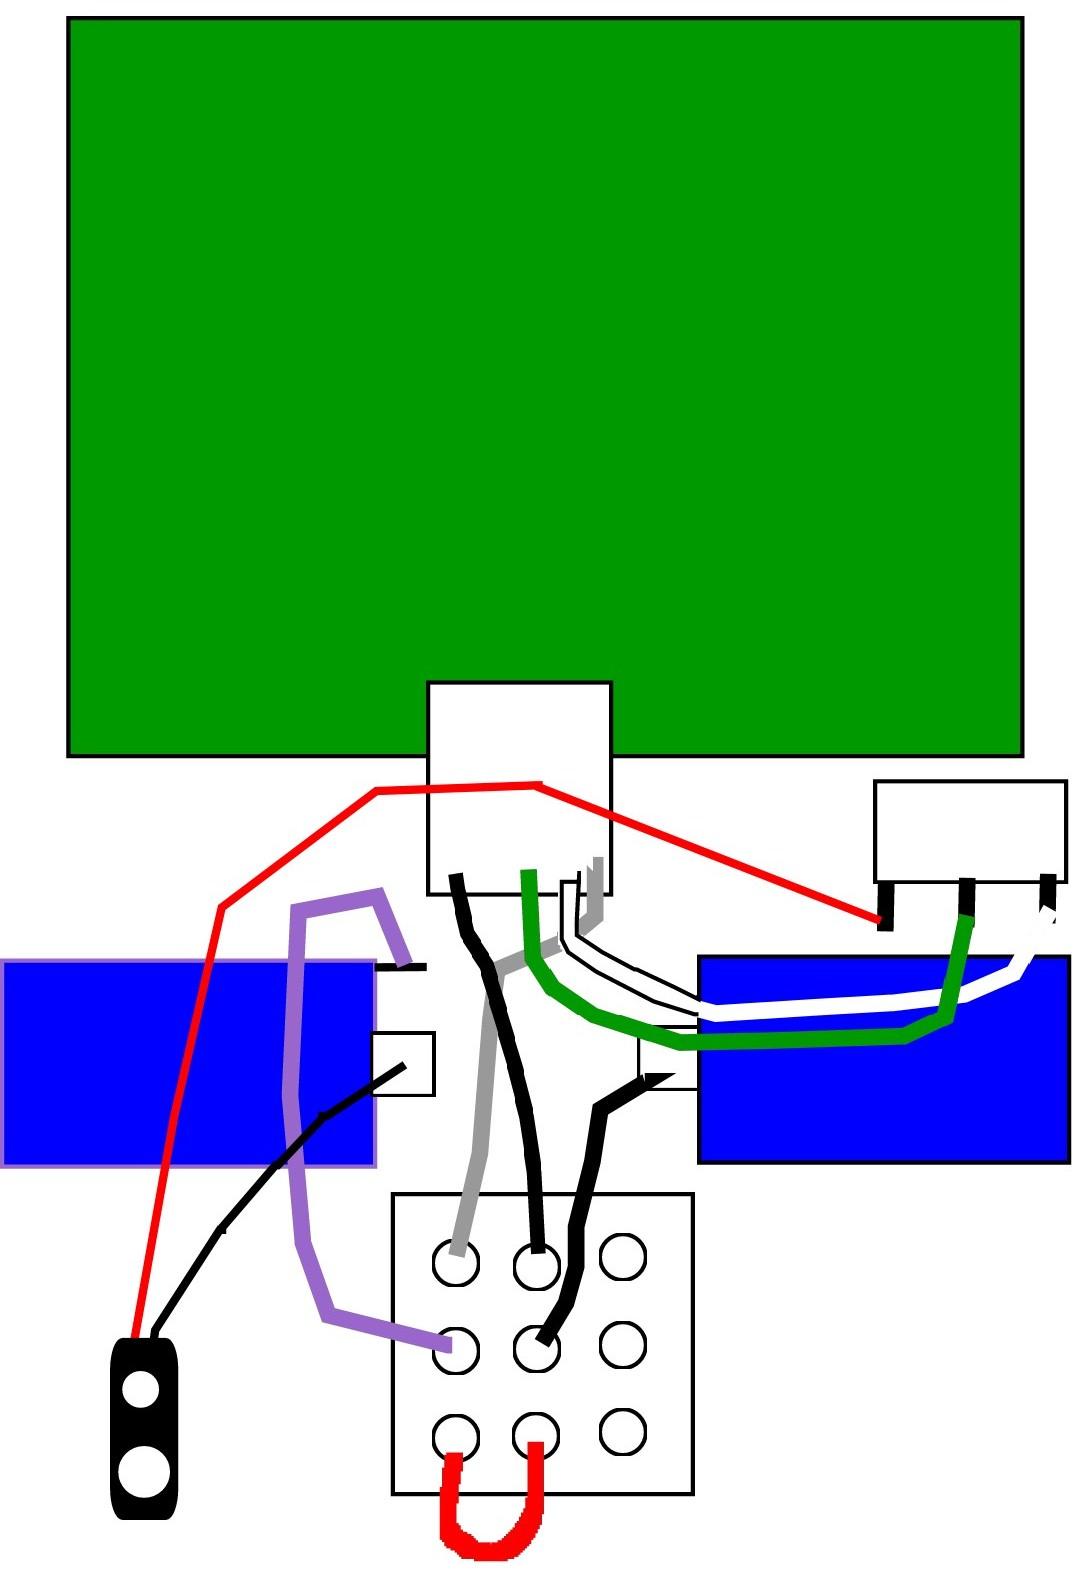 hight resolution of 2 sd hoist wiring diagram electric pallet jack diagram yale cpv hoist wiring diagram yale electric chain hoist wiring diagram